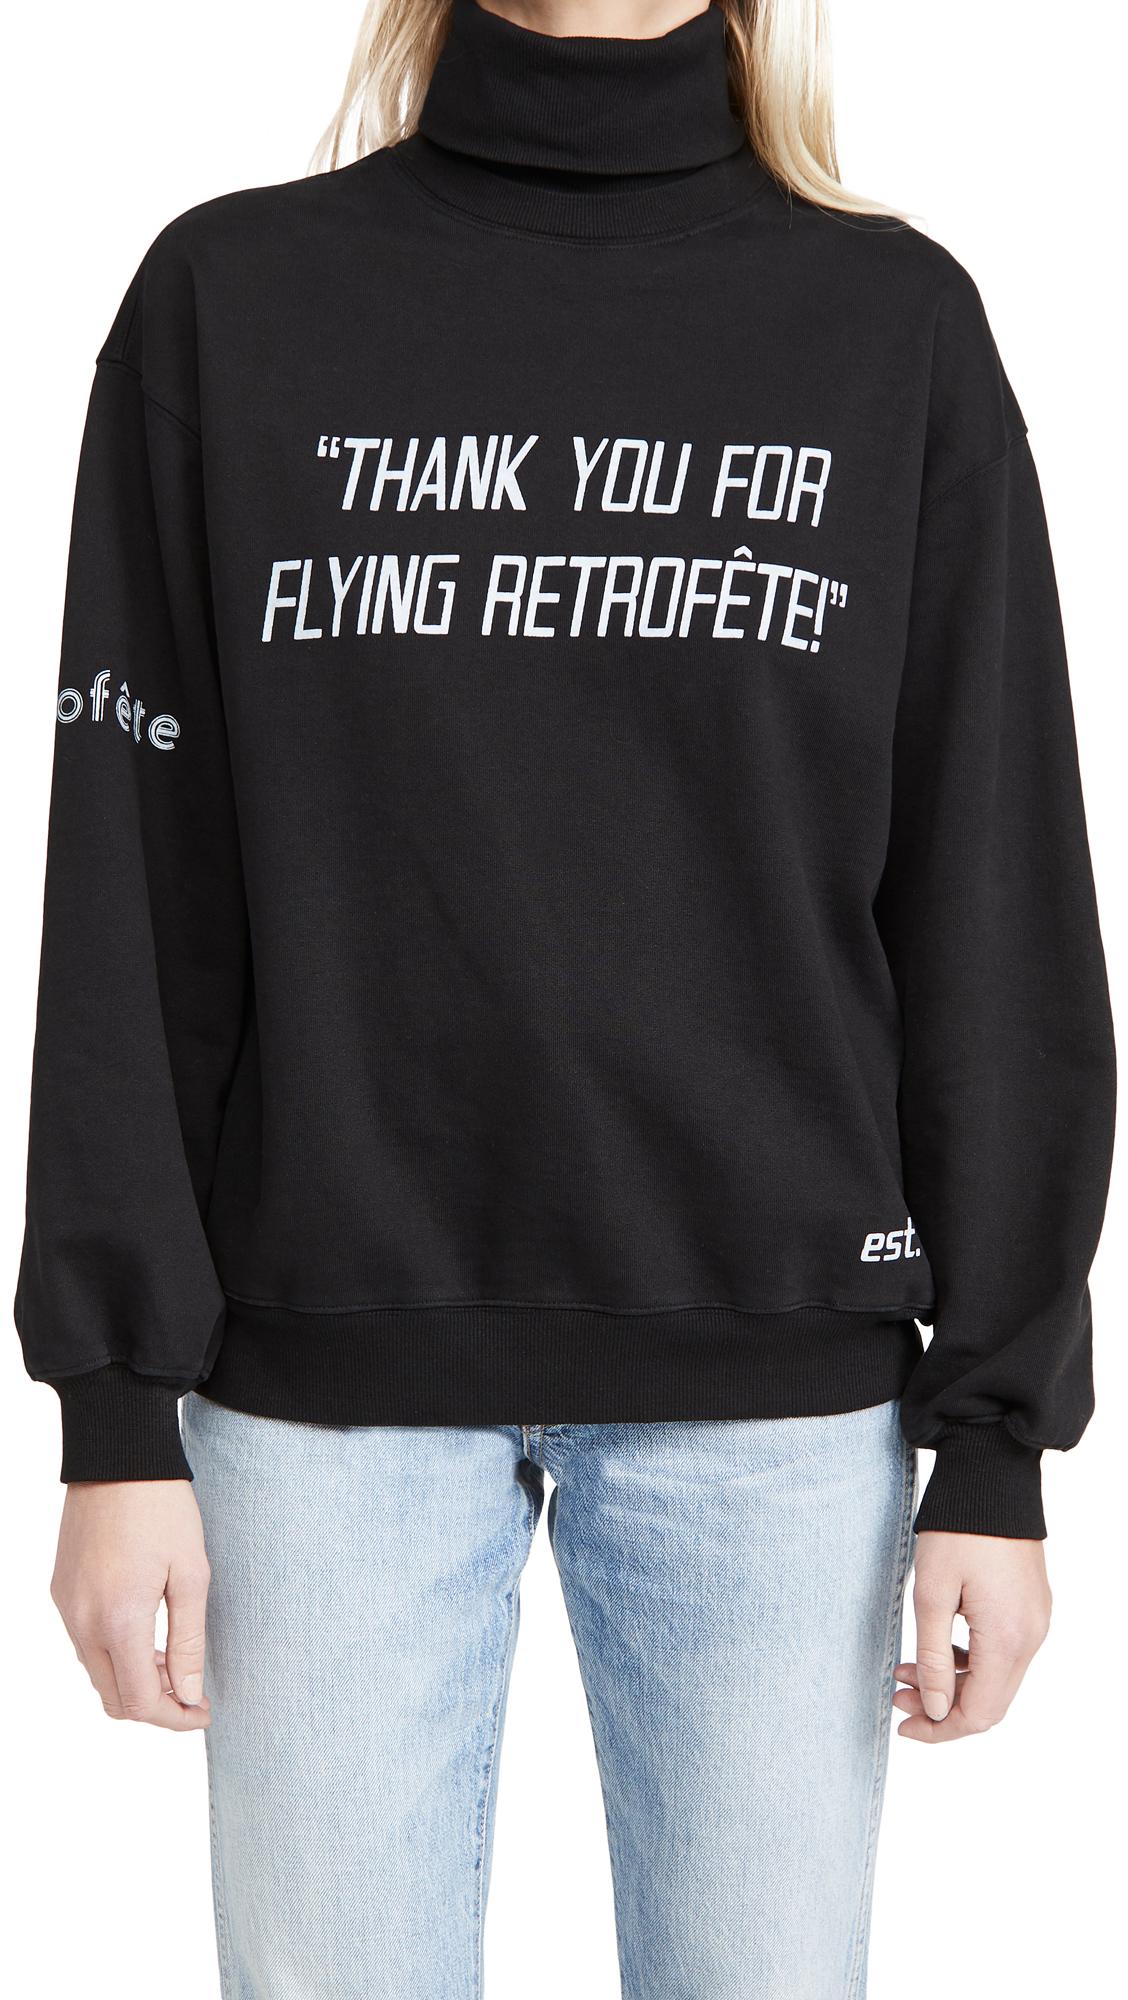 Retrofete Flying Over Sweatshirt